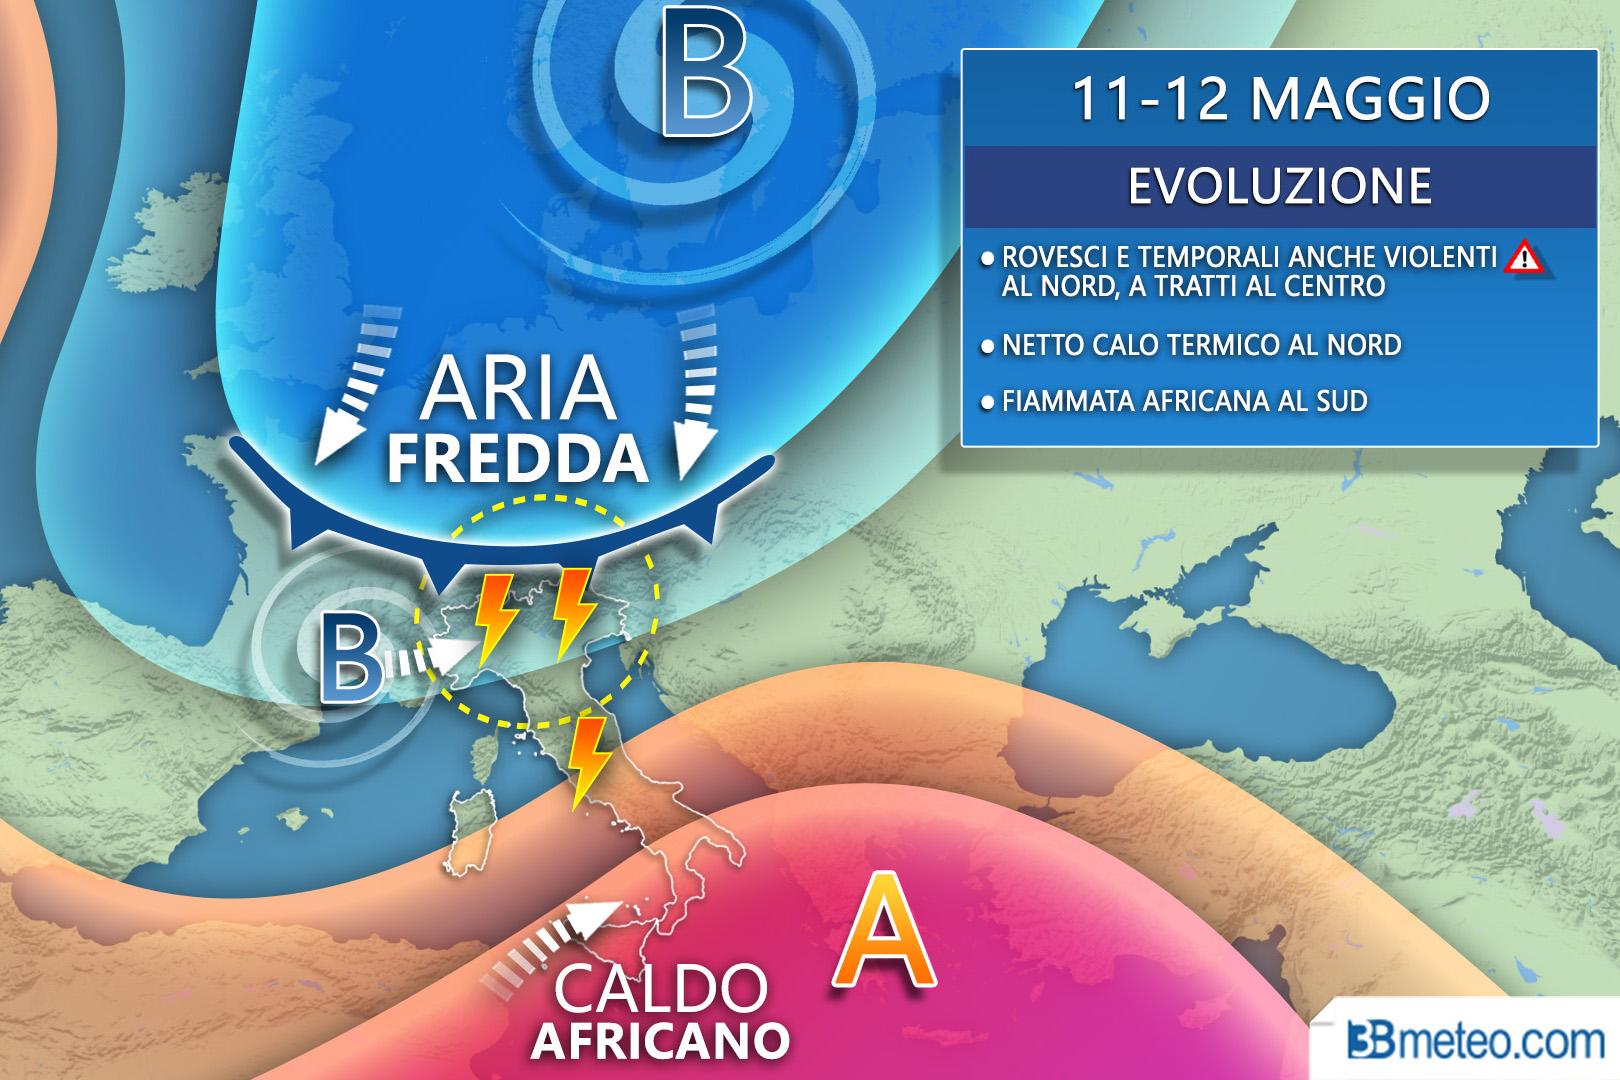 11-12 Maggio europea meteo italia